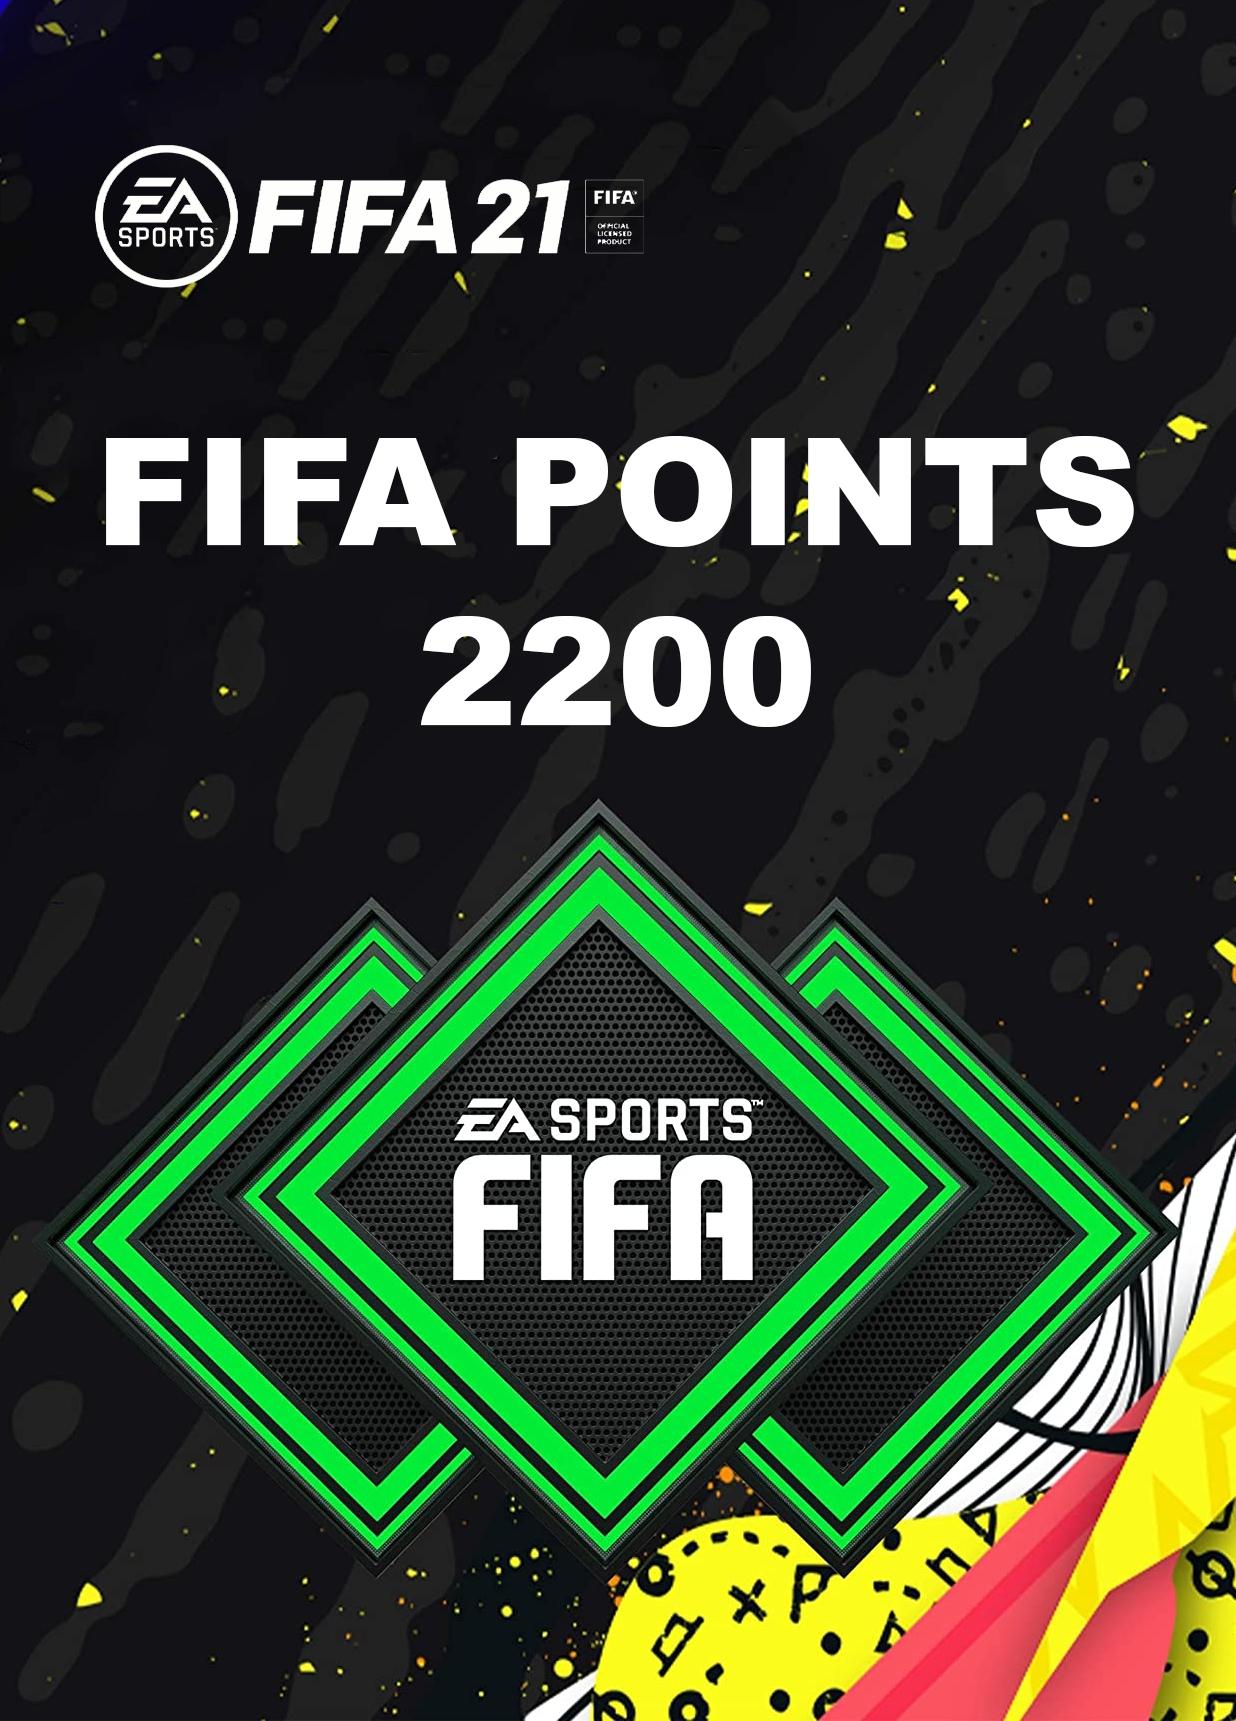 fifa 21 - 2200 fut points ✅(origin key)+podarok 1349 rur